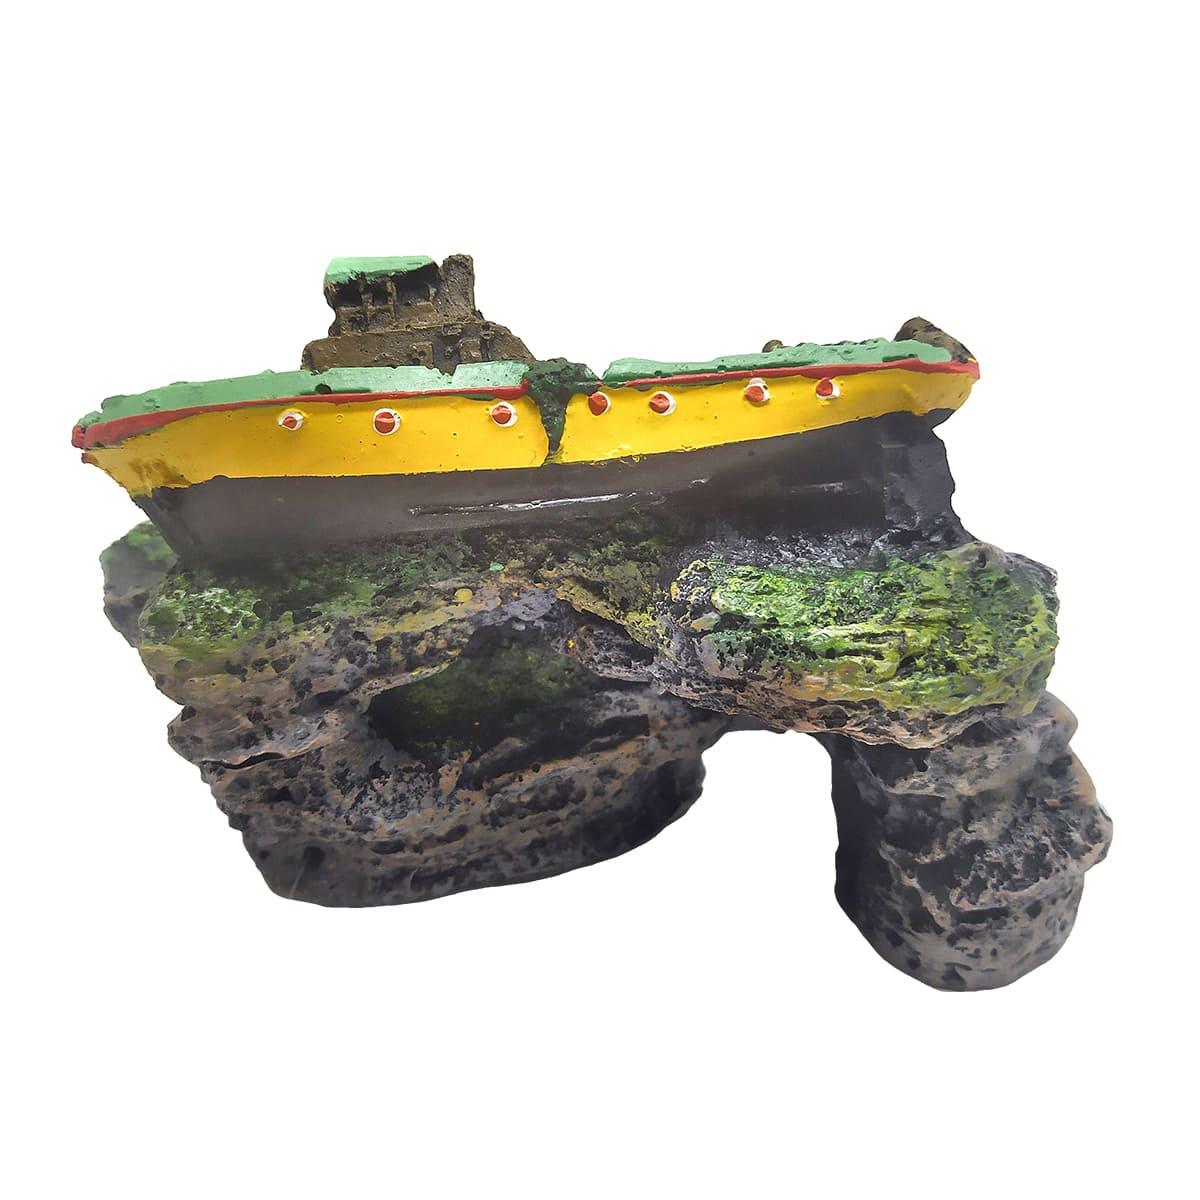 Enfeite para Aquários BARCO DIESEL - Fragata Ornamentos